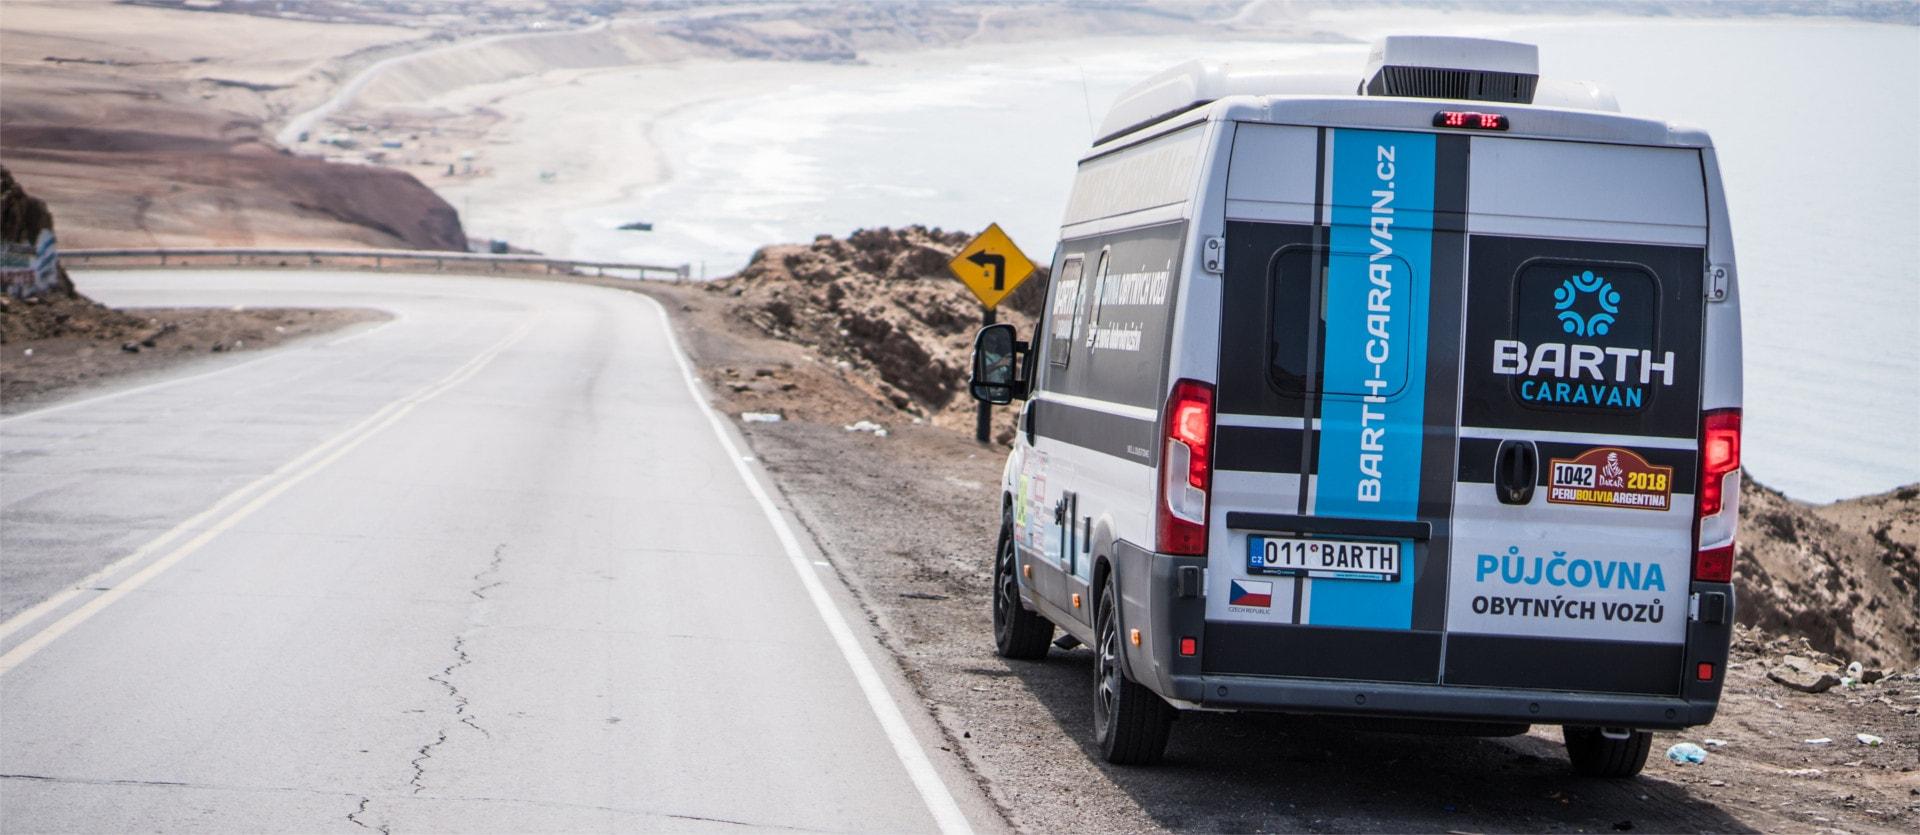 Hymer Car na Rallye Dakar